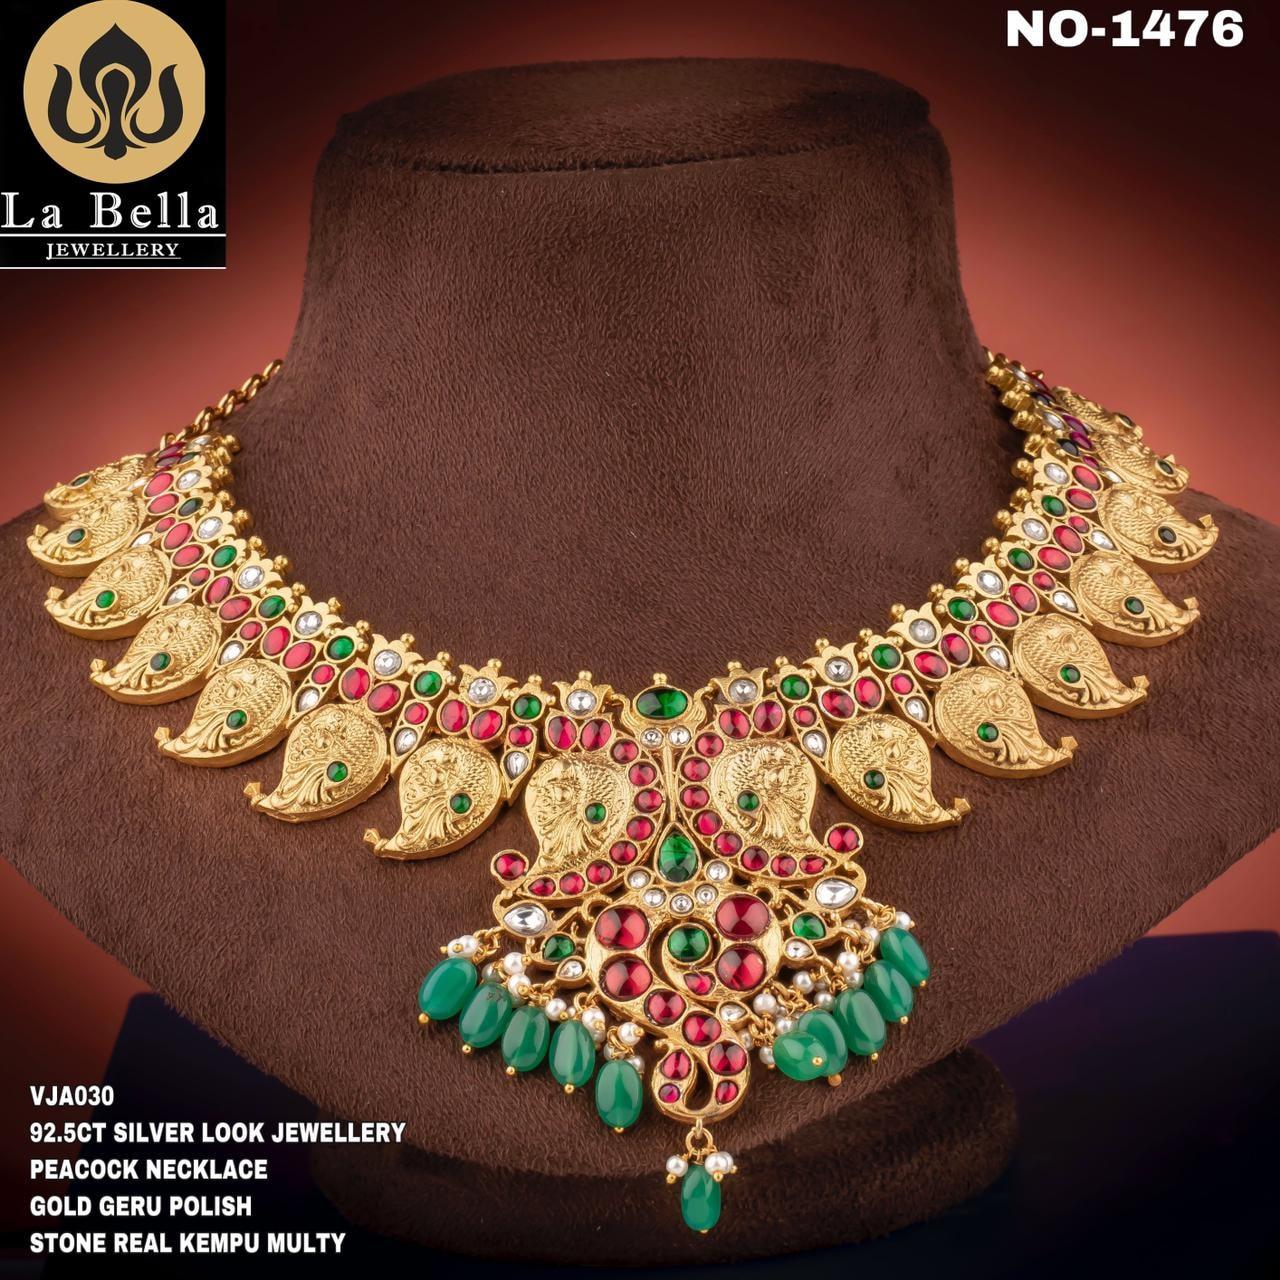 Stunning one gram gold mango necklace studded with kempu stones. one gram gold thali chain 1 gram necklace 1 gram gold necklace with price